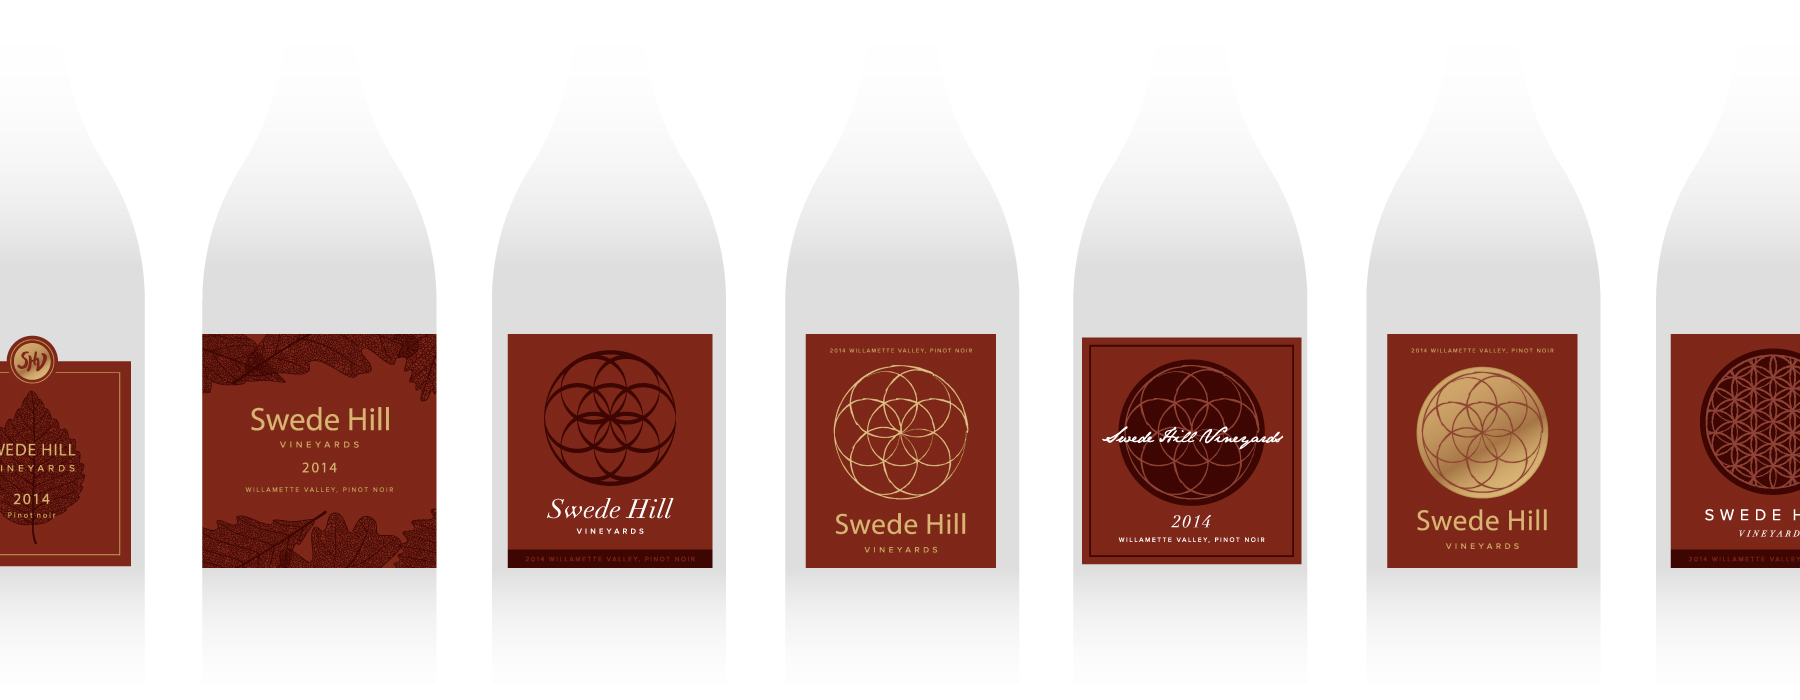 Swede-Hill-Process.jpg